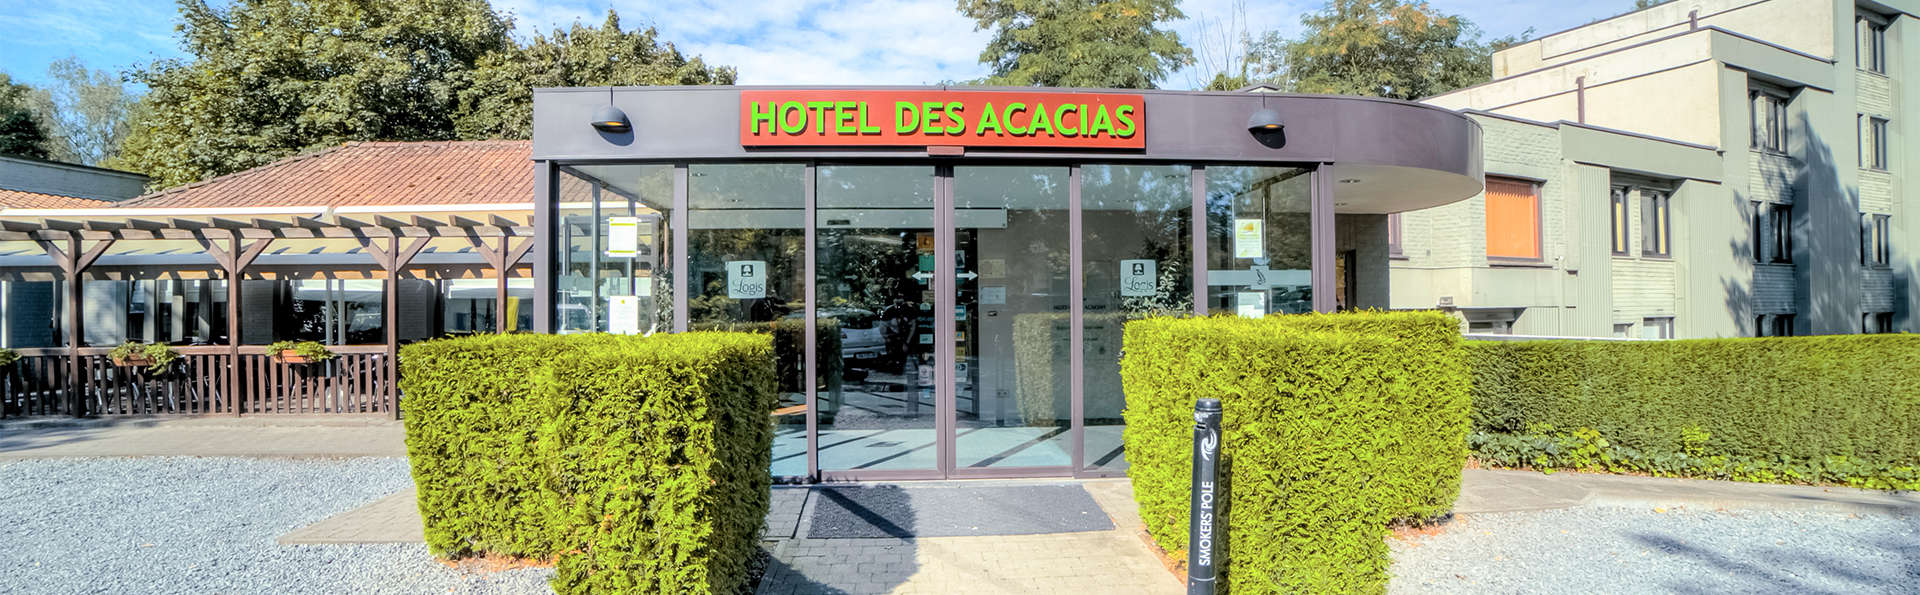 Logis Hôtel - Restaurant des Acacias - EDIT_ext3.jpg